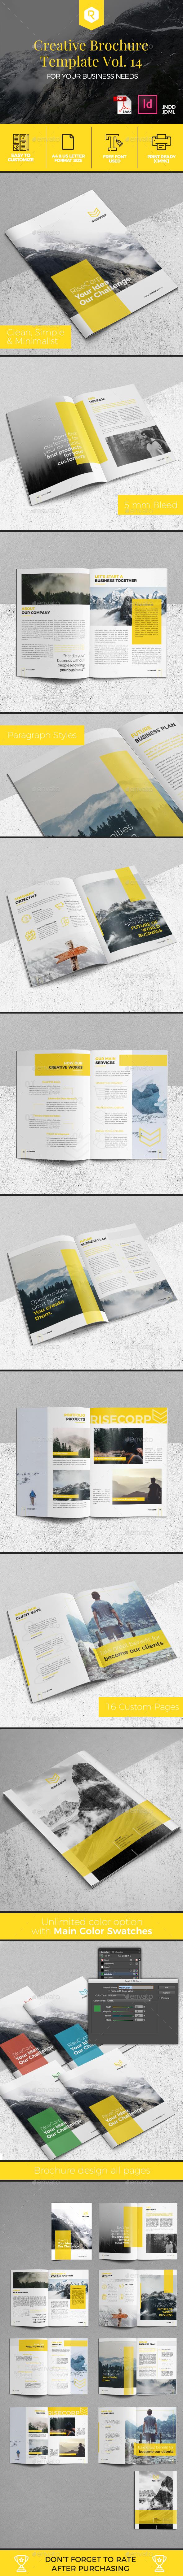 Creative Brochure Template Vol. 14 - Corporate Brochures